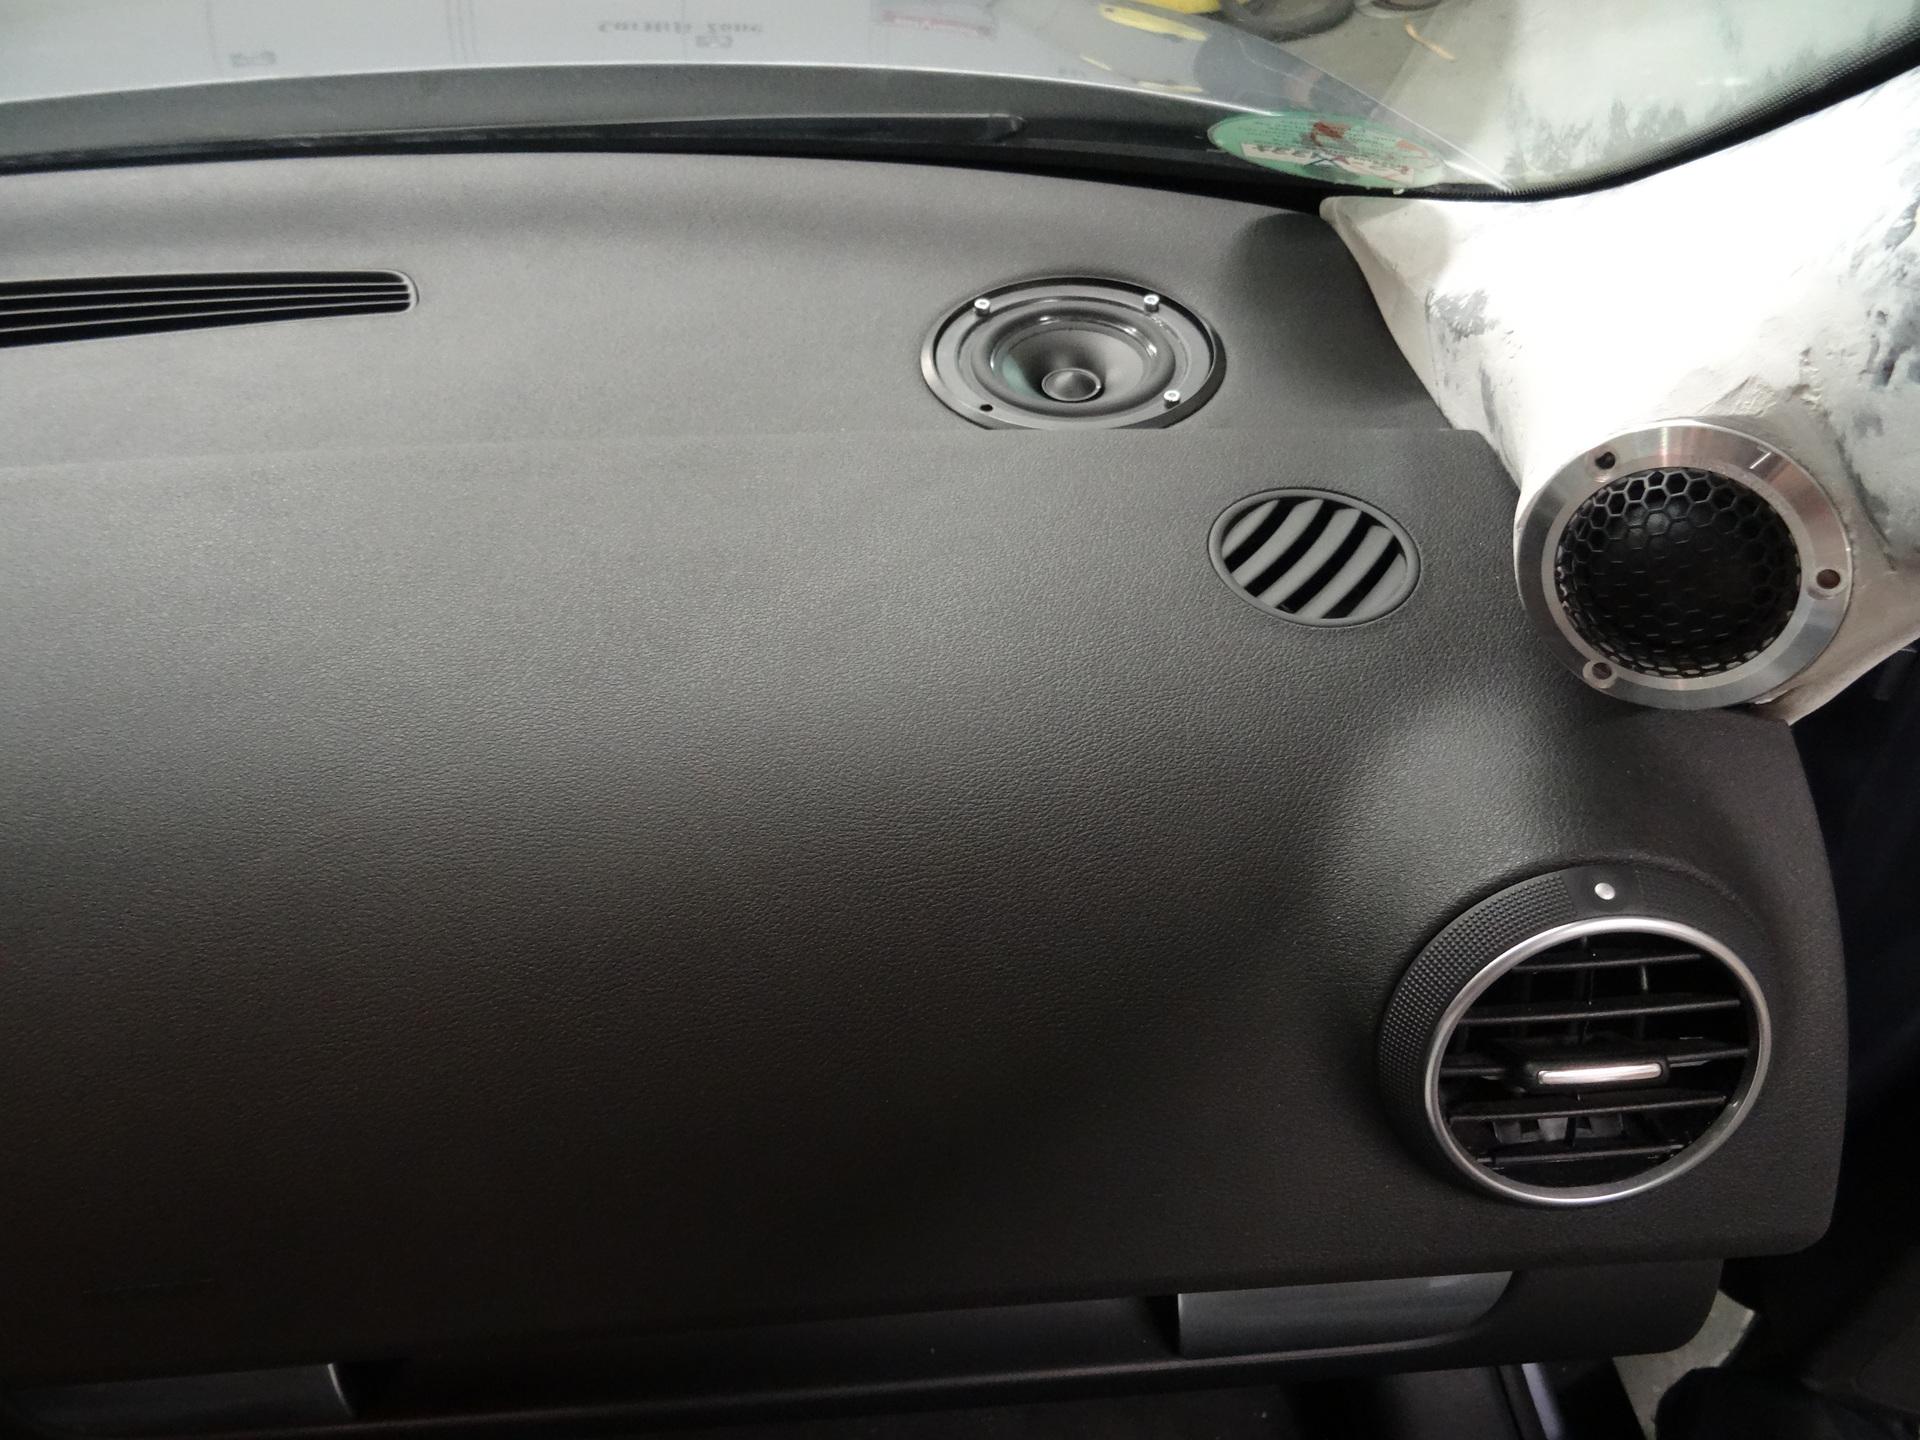 Umbau Armaturenbrett Mitteltöneraufnahme Audi A3 8p   8p, a3 ...   {Armaturenbrett audi 16}